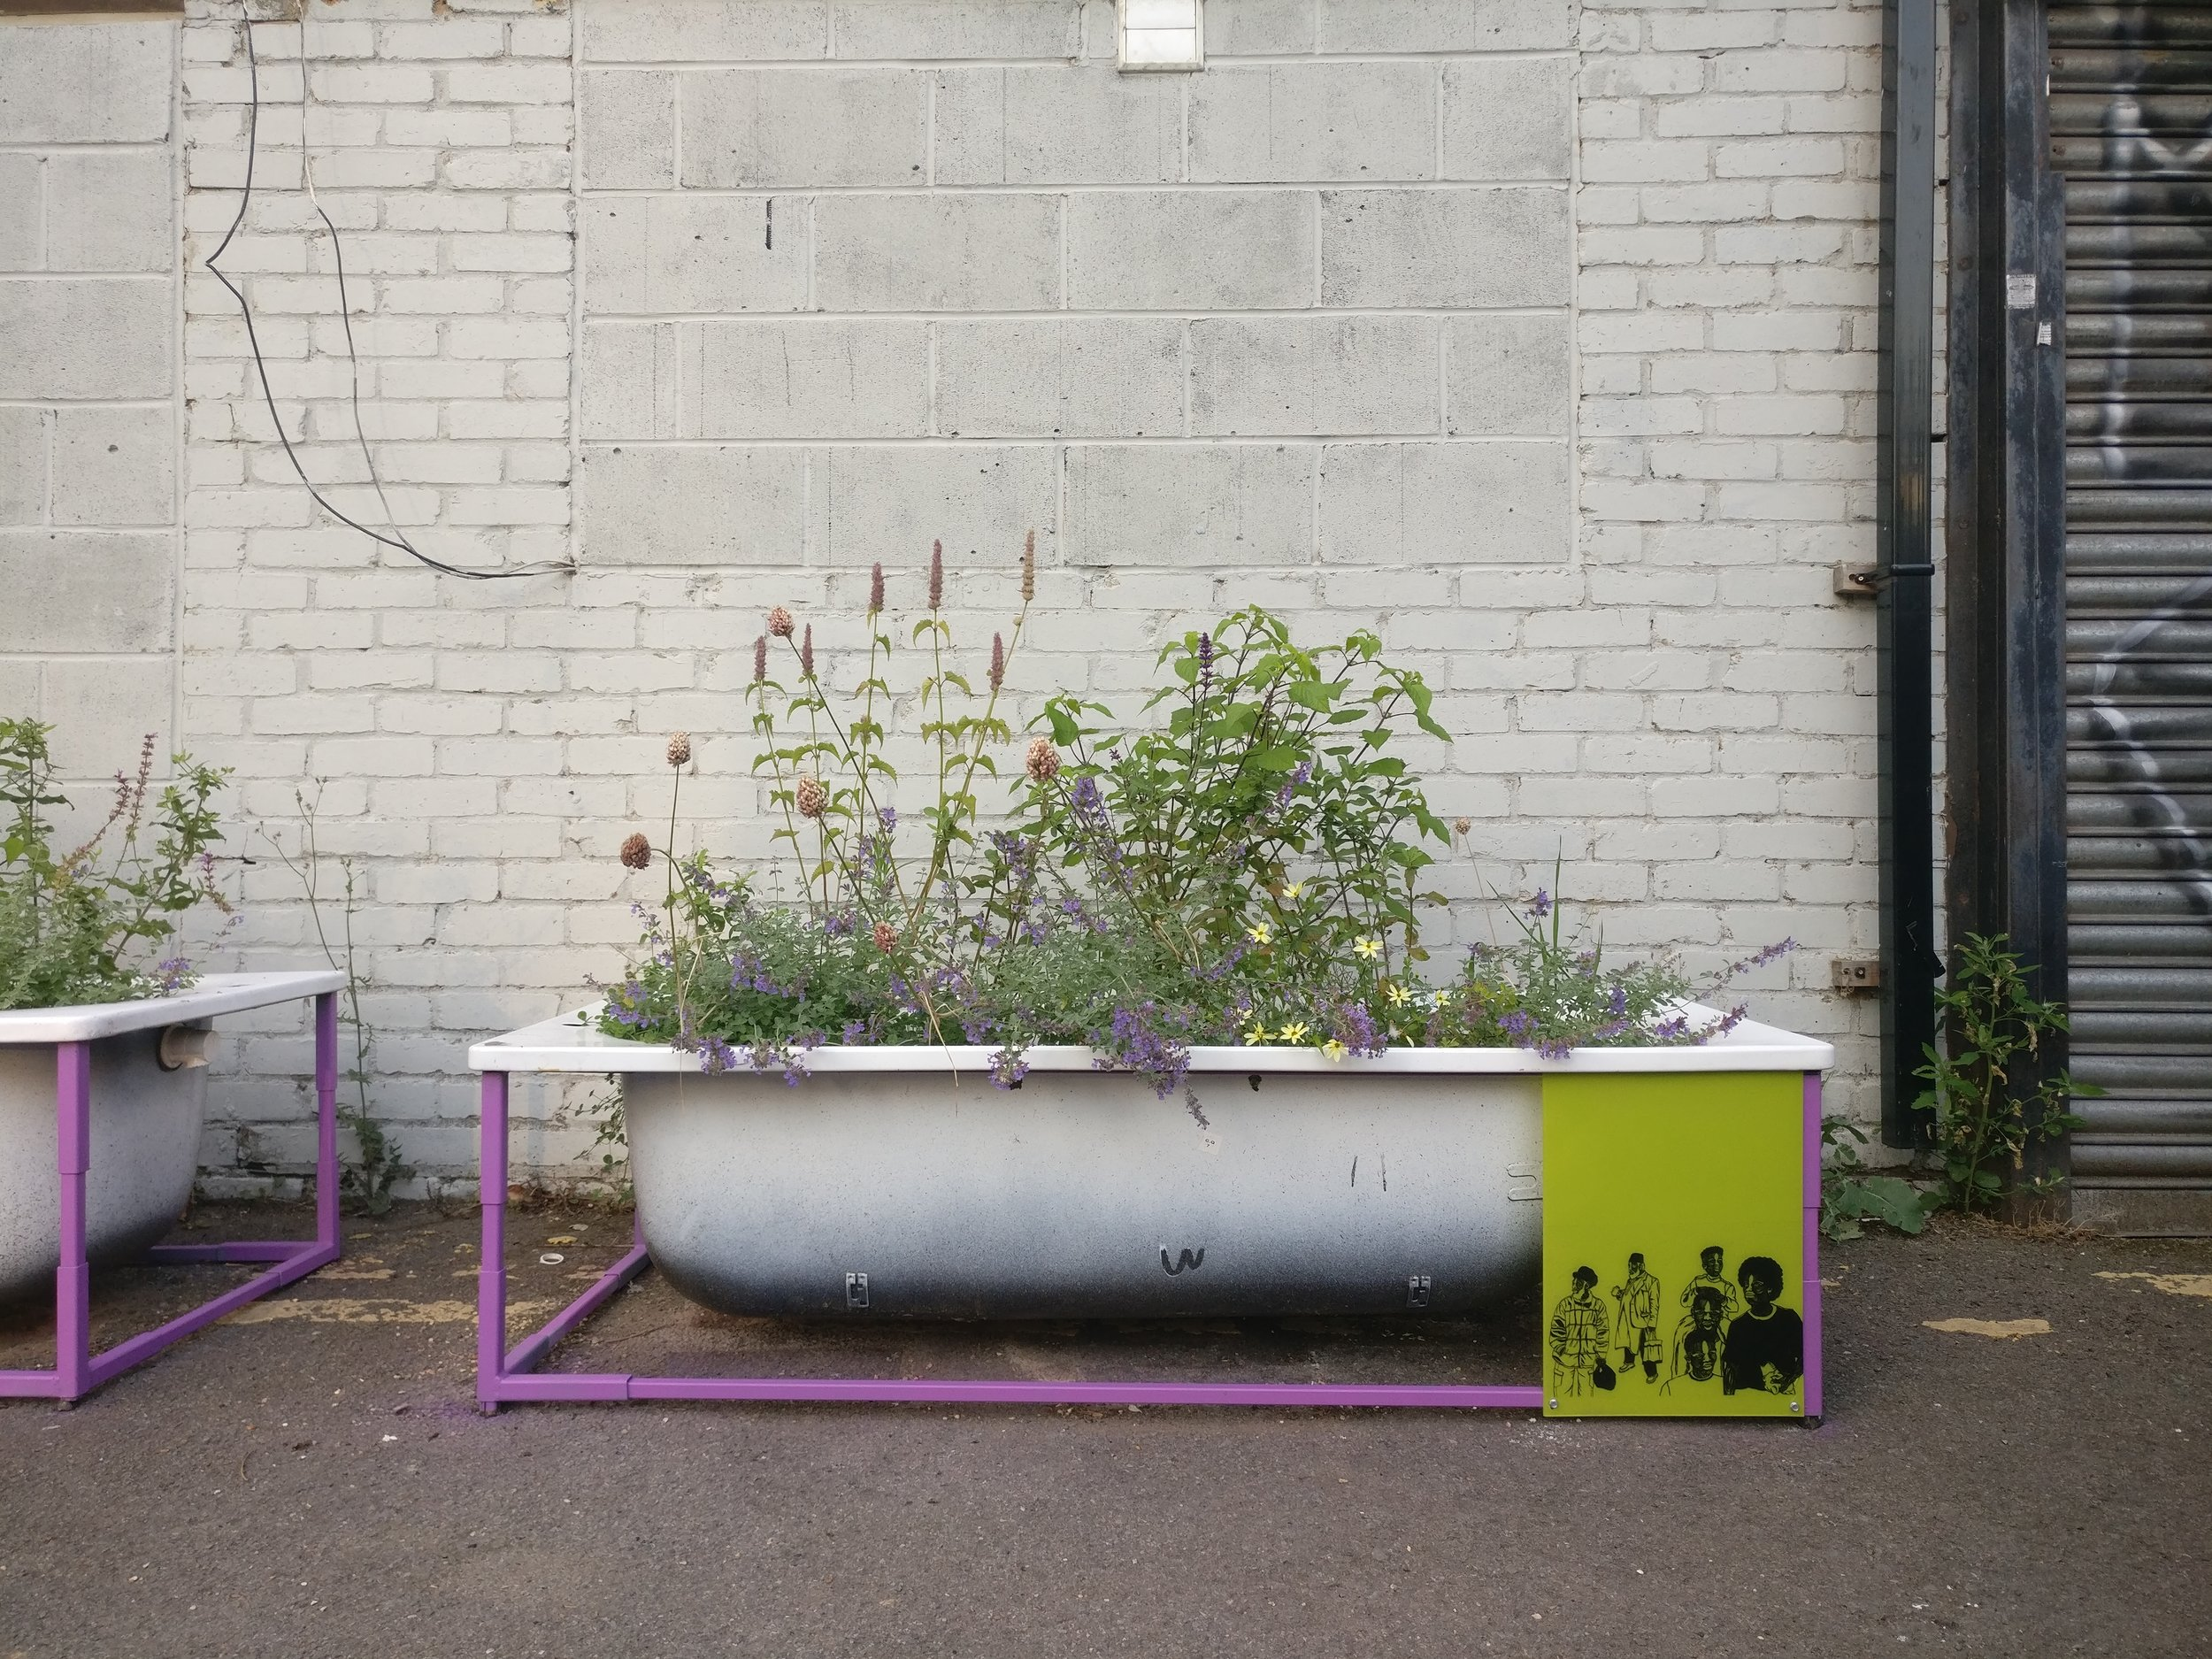 PEER tub artwork 2/2